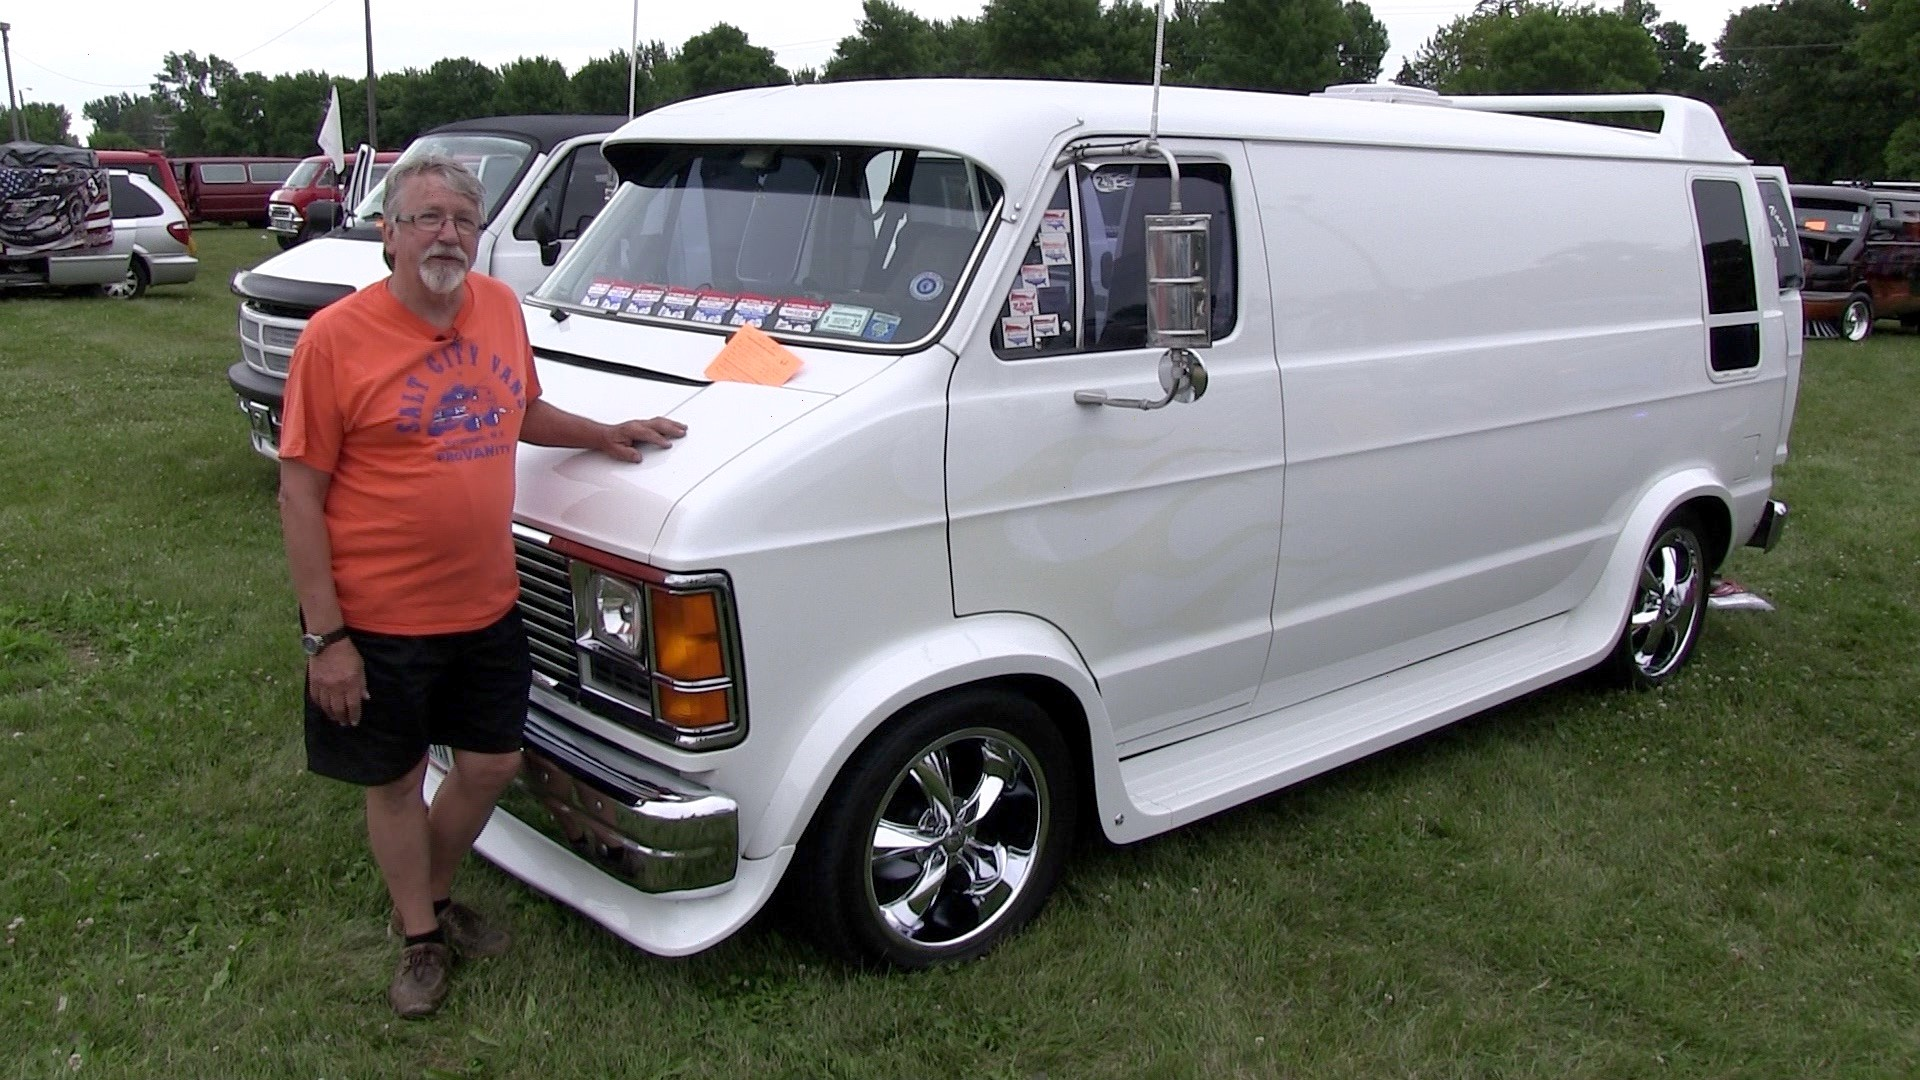 Larry Floss' 1989 Dodge